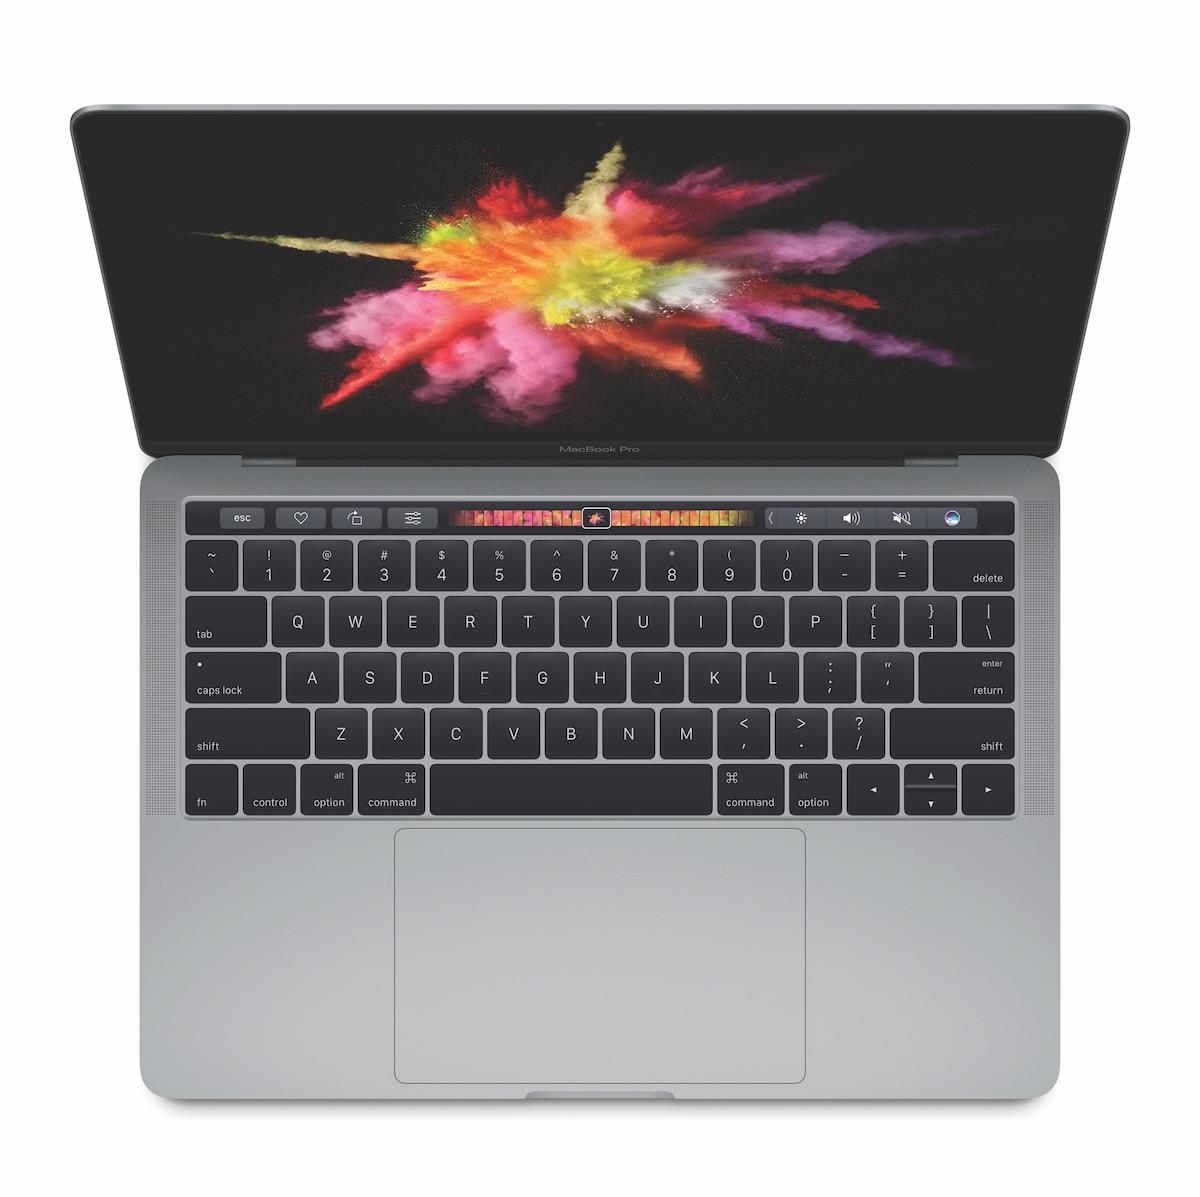 300 Franken günstiger – MacBook Pro